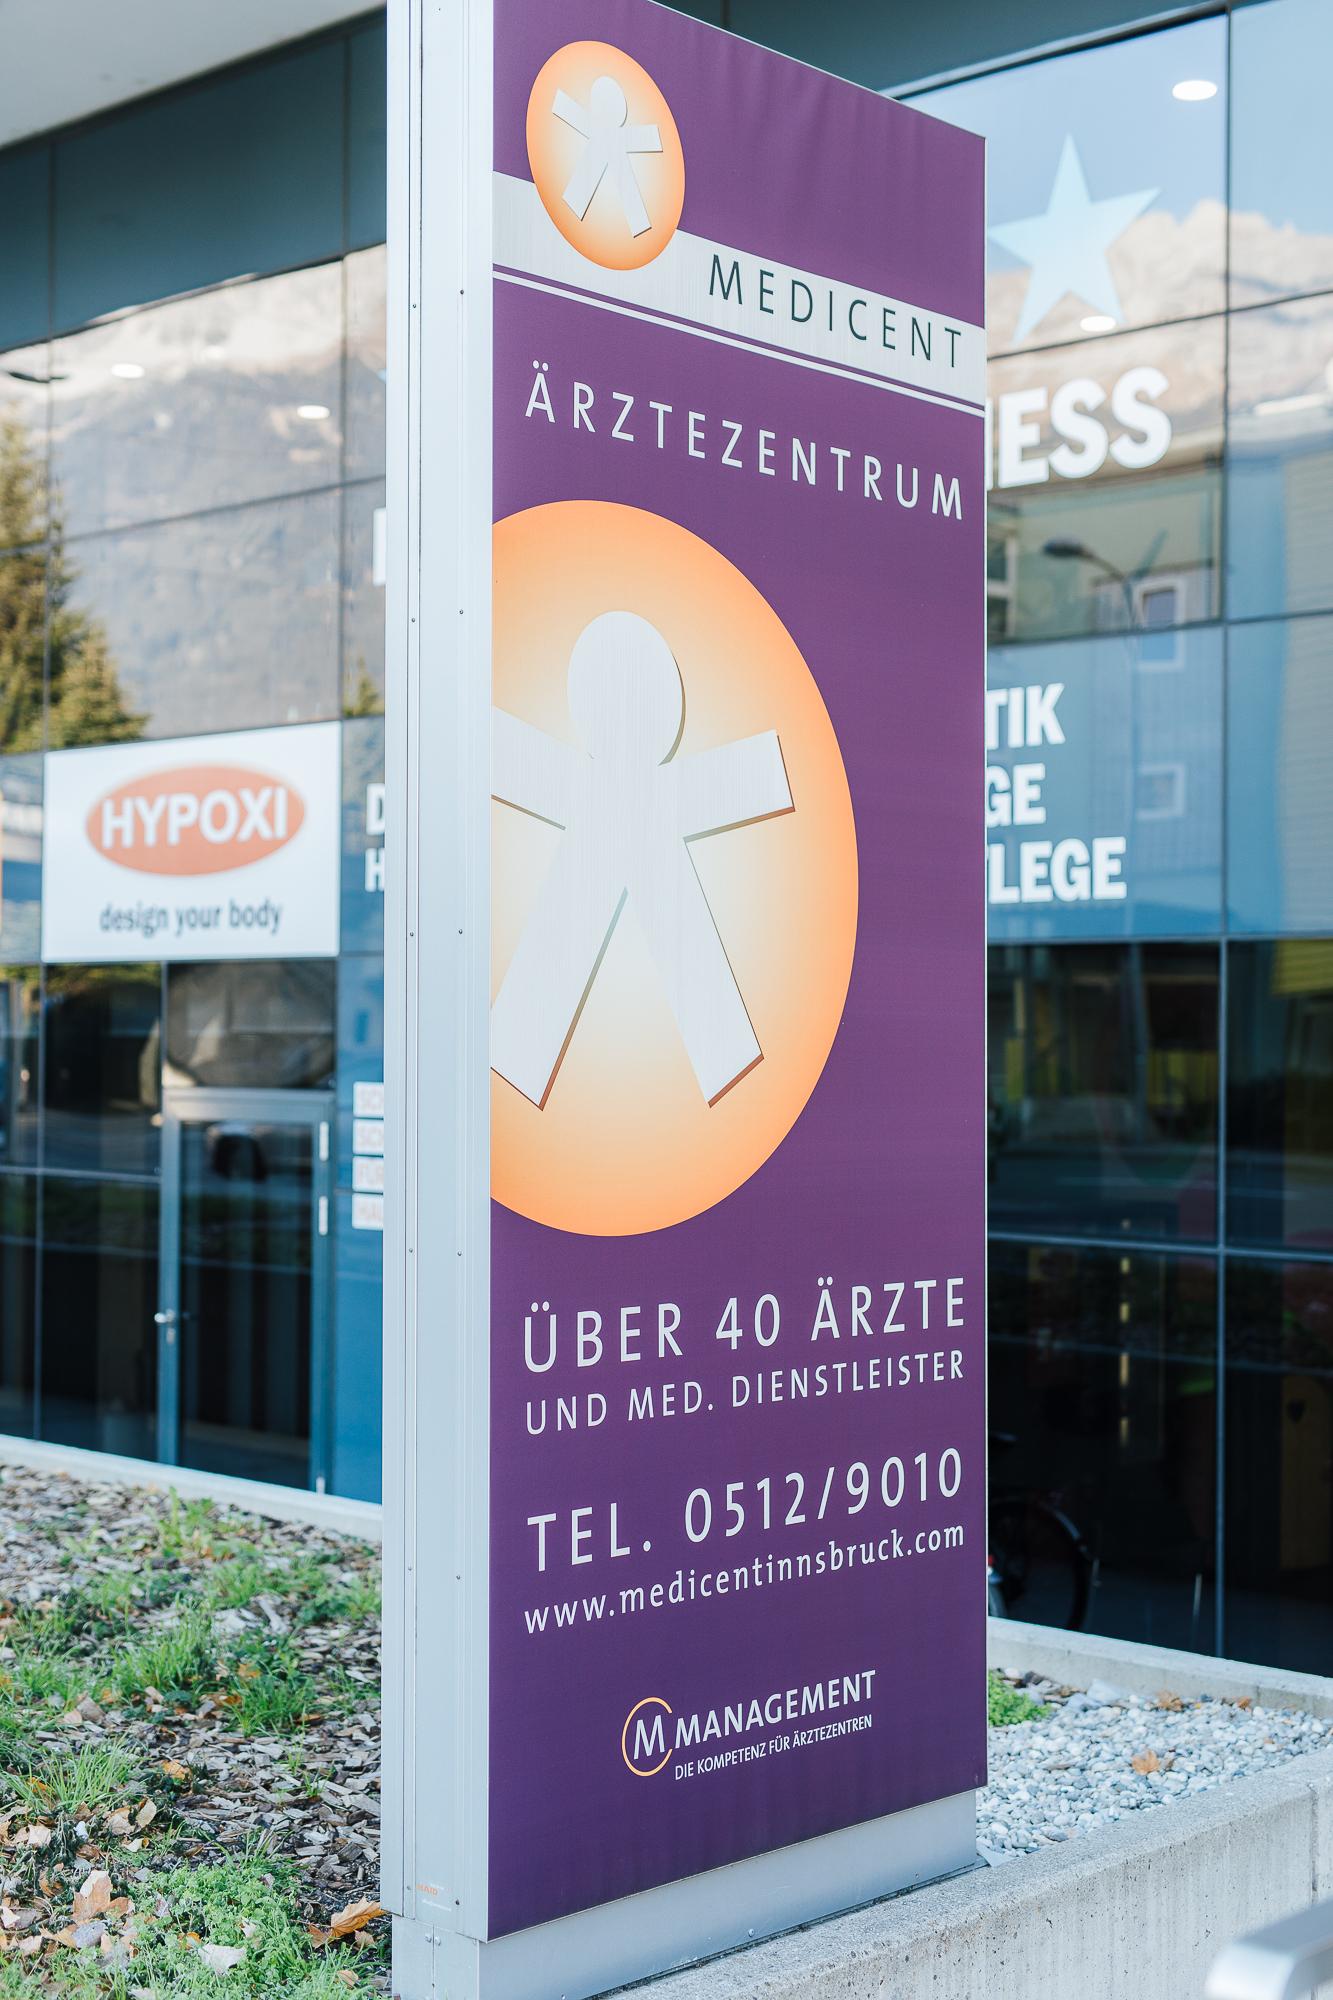 Dr. Martin Dostal Praxis Medicent Innsbruck